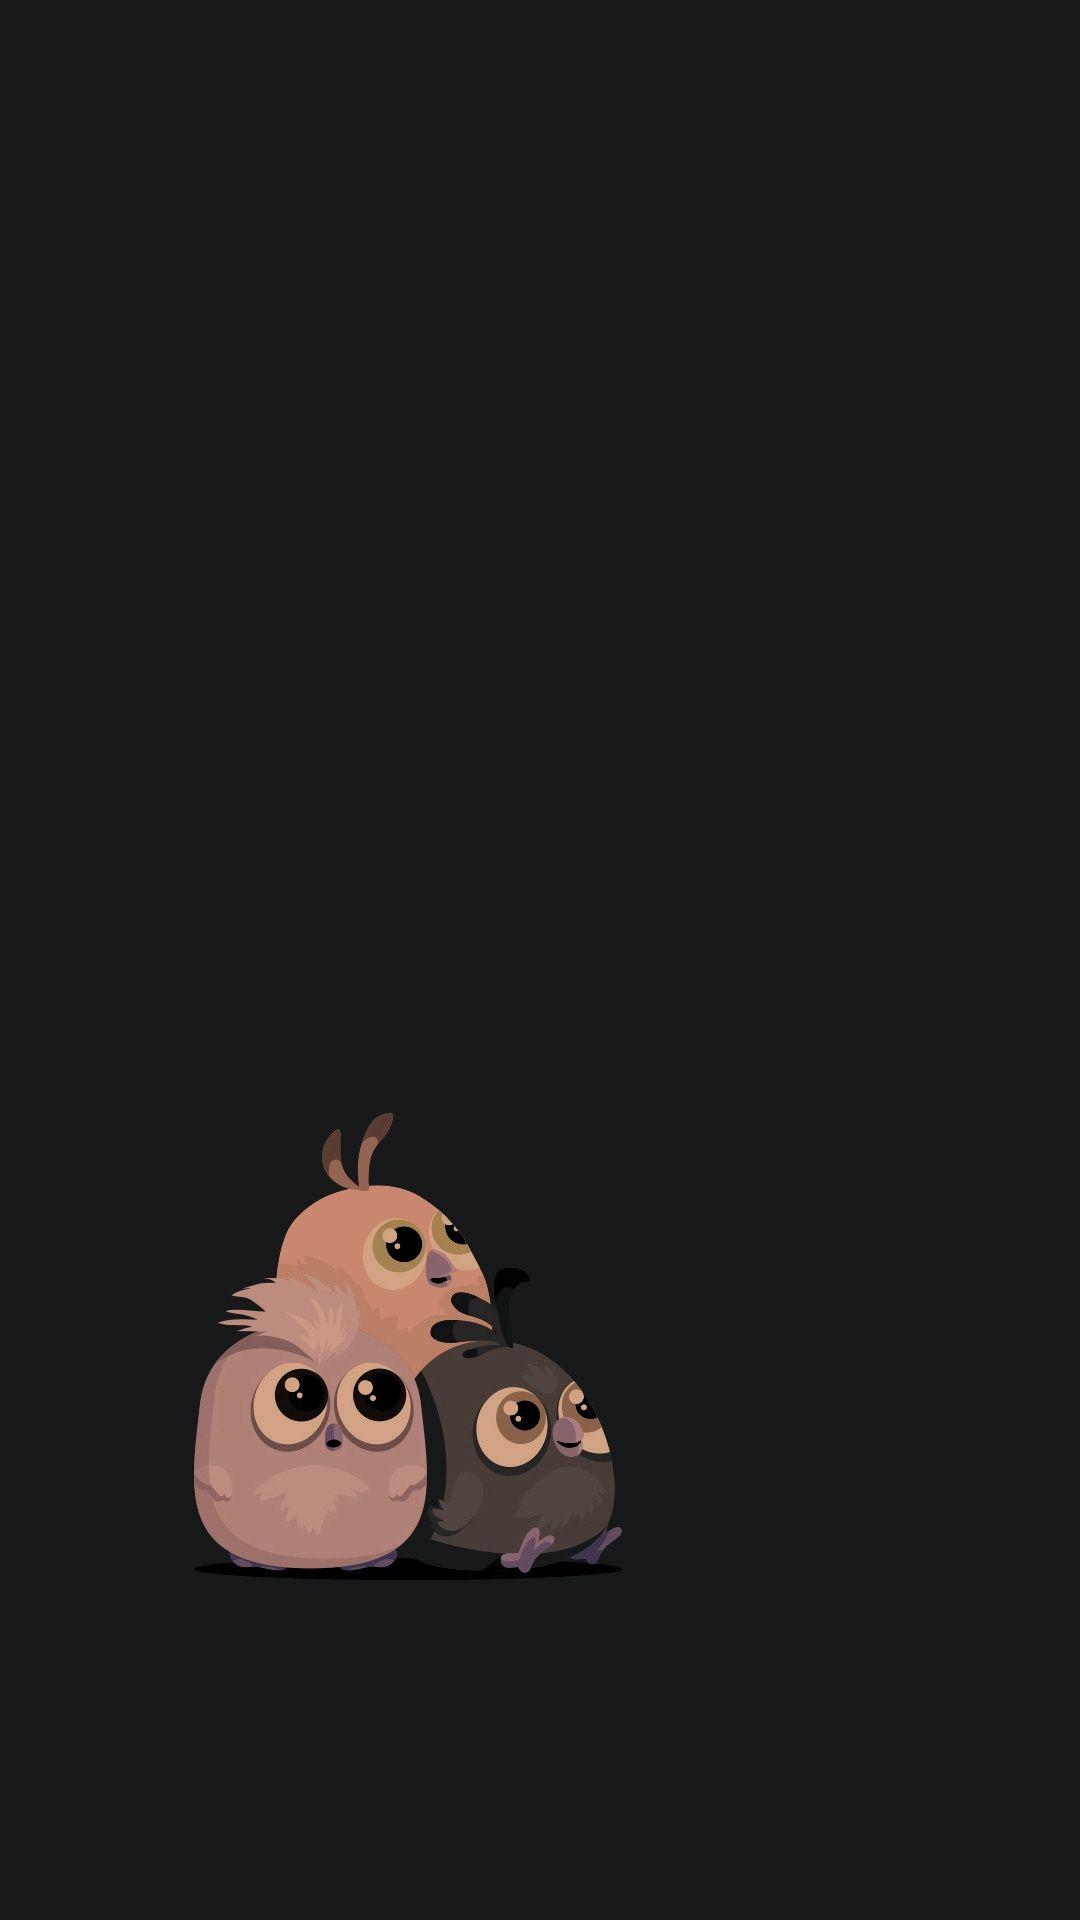 Simple Clean Wallpaper Cartoon Wallpaper Iphone Cute Owls Wallpaper Cute Cartoon Wallpapers